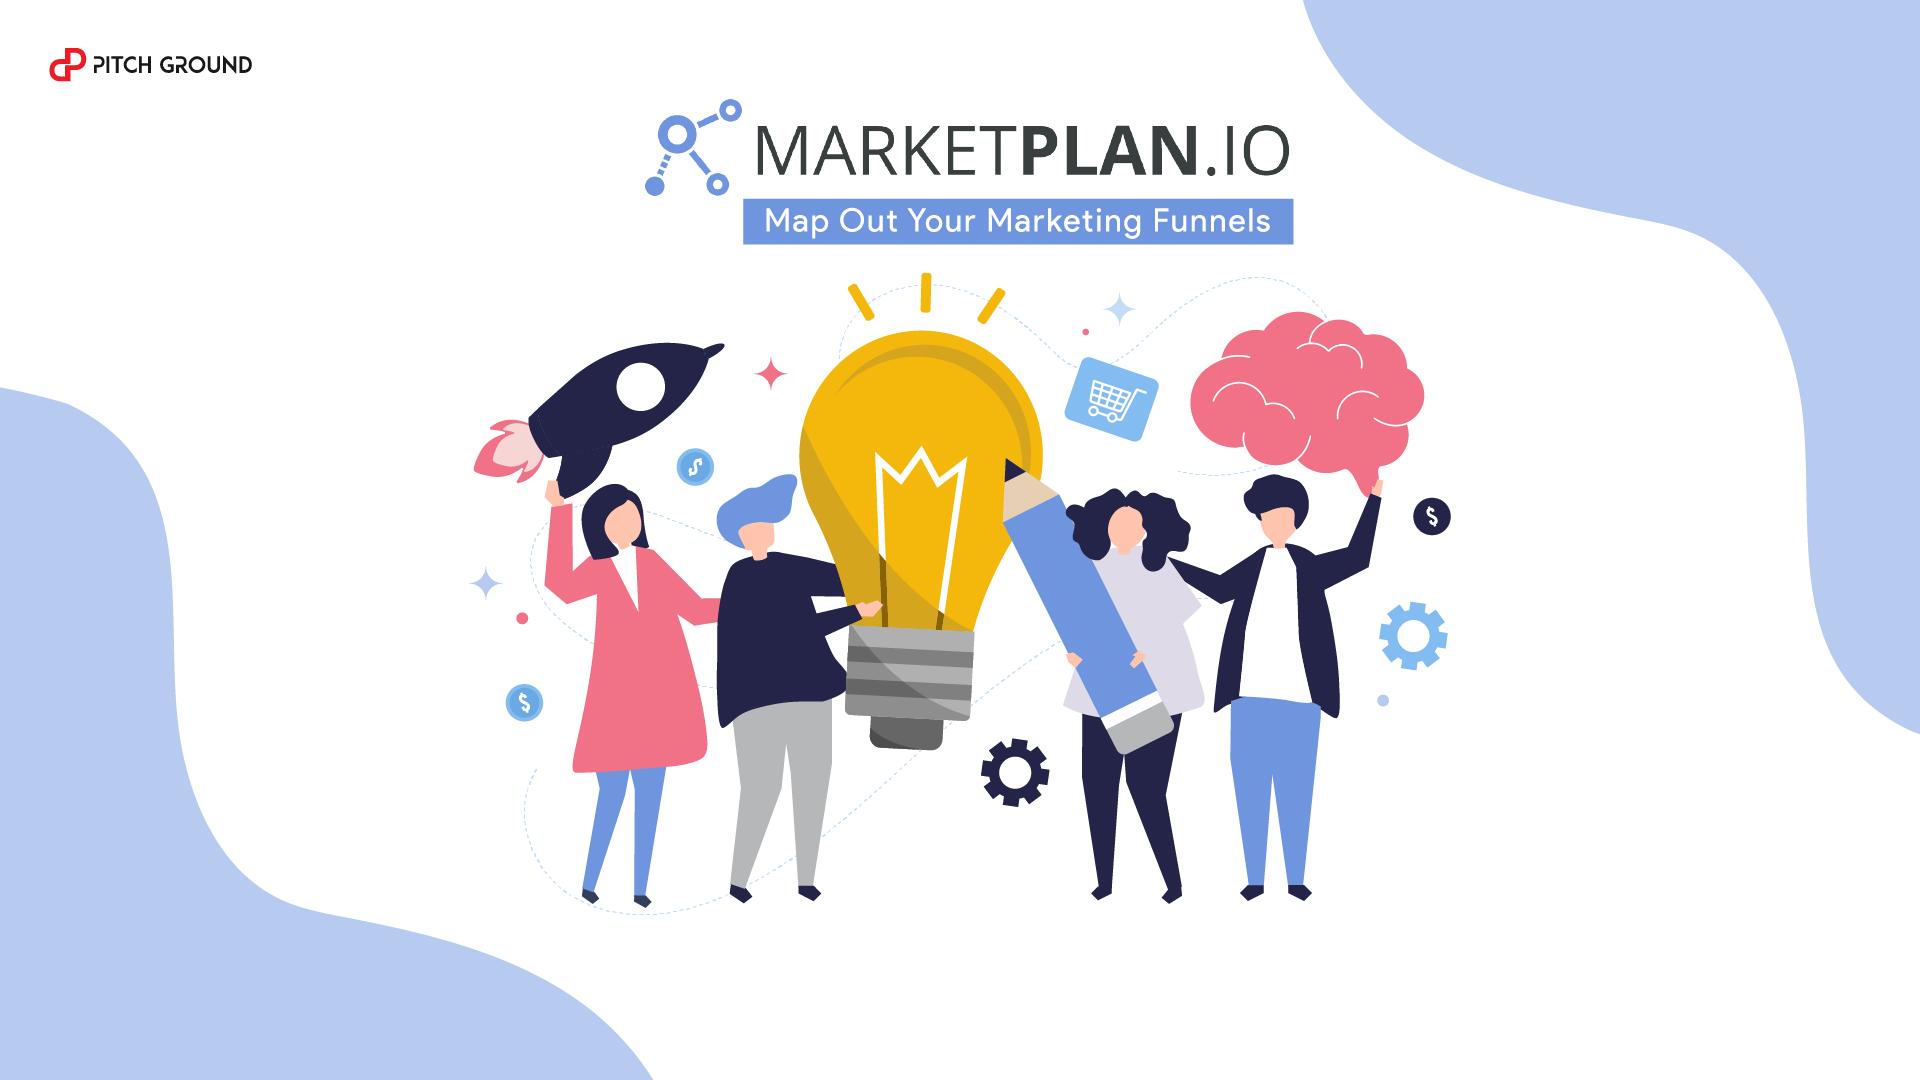 marketplanio